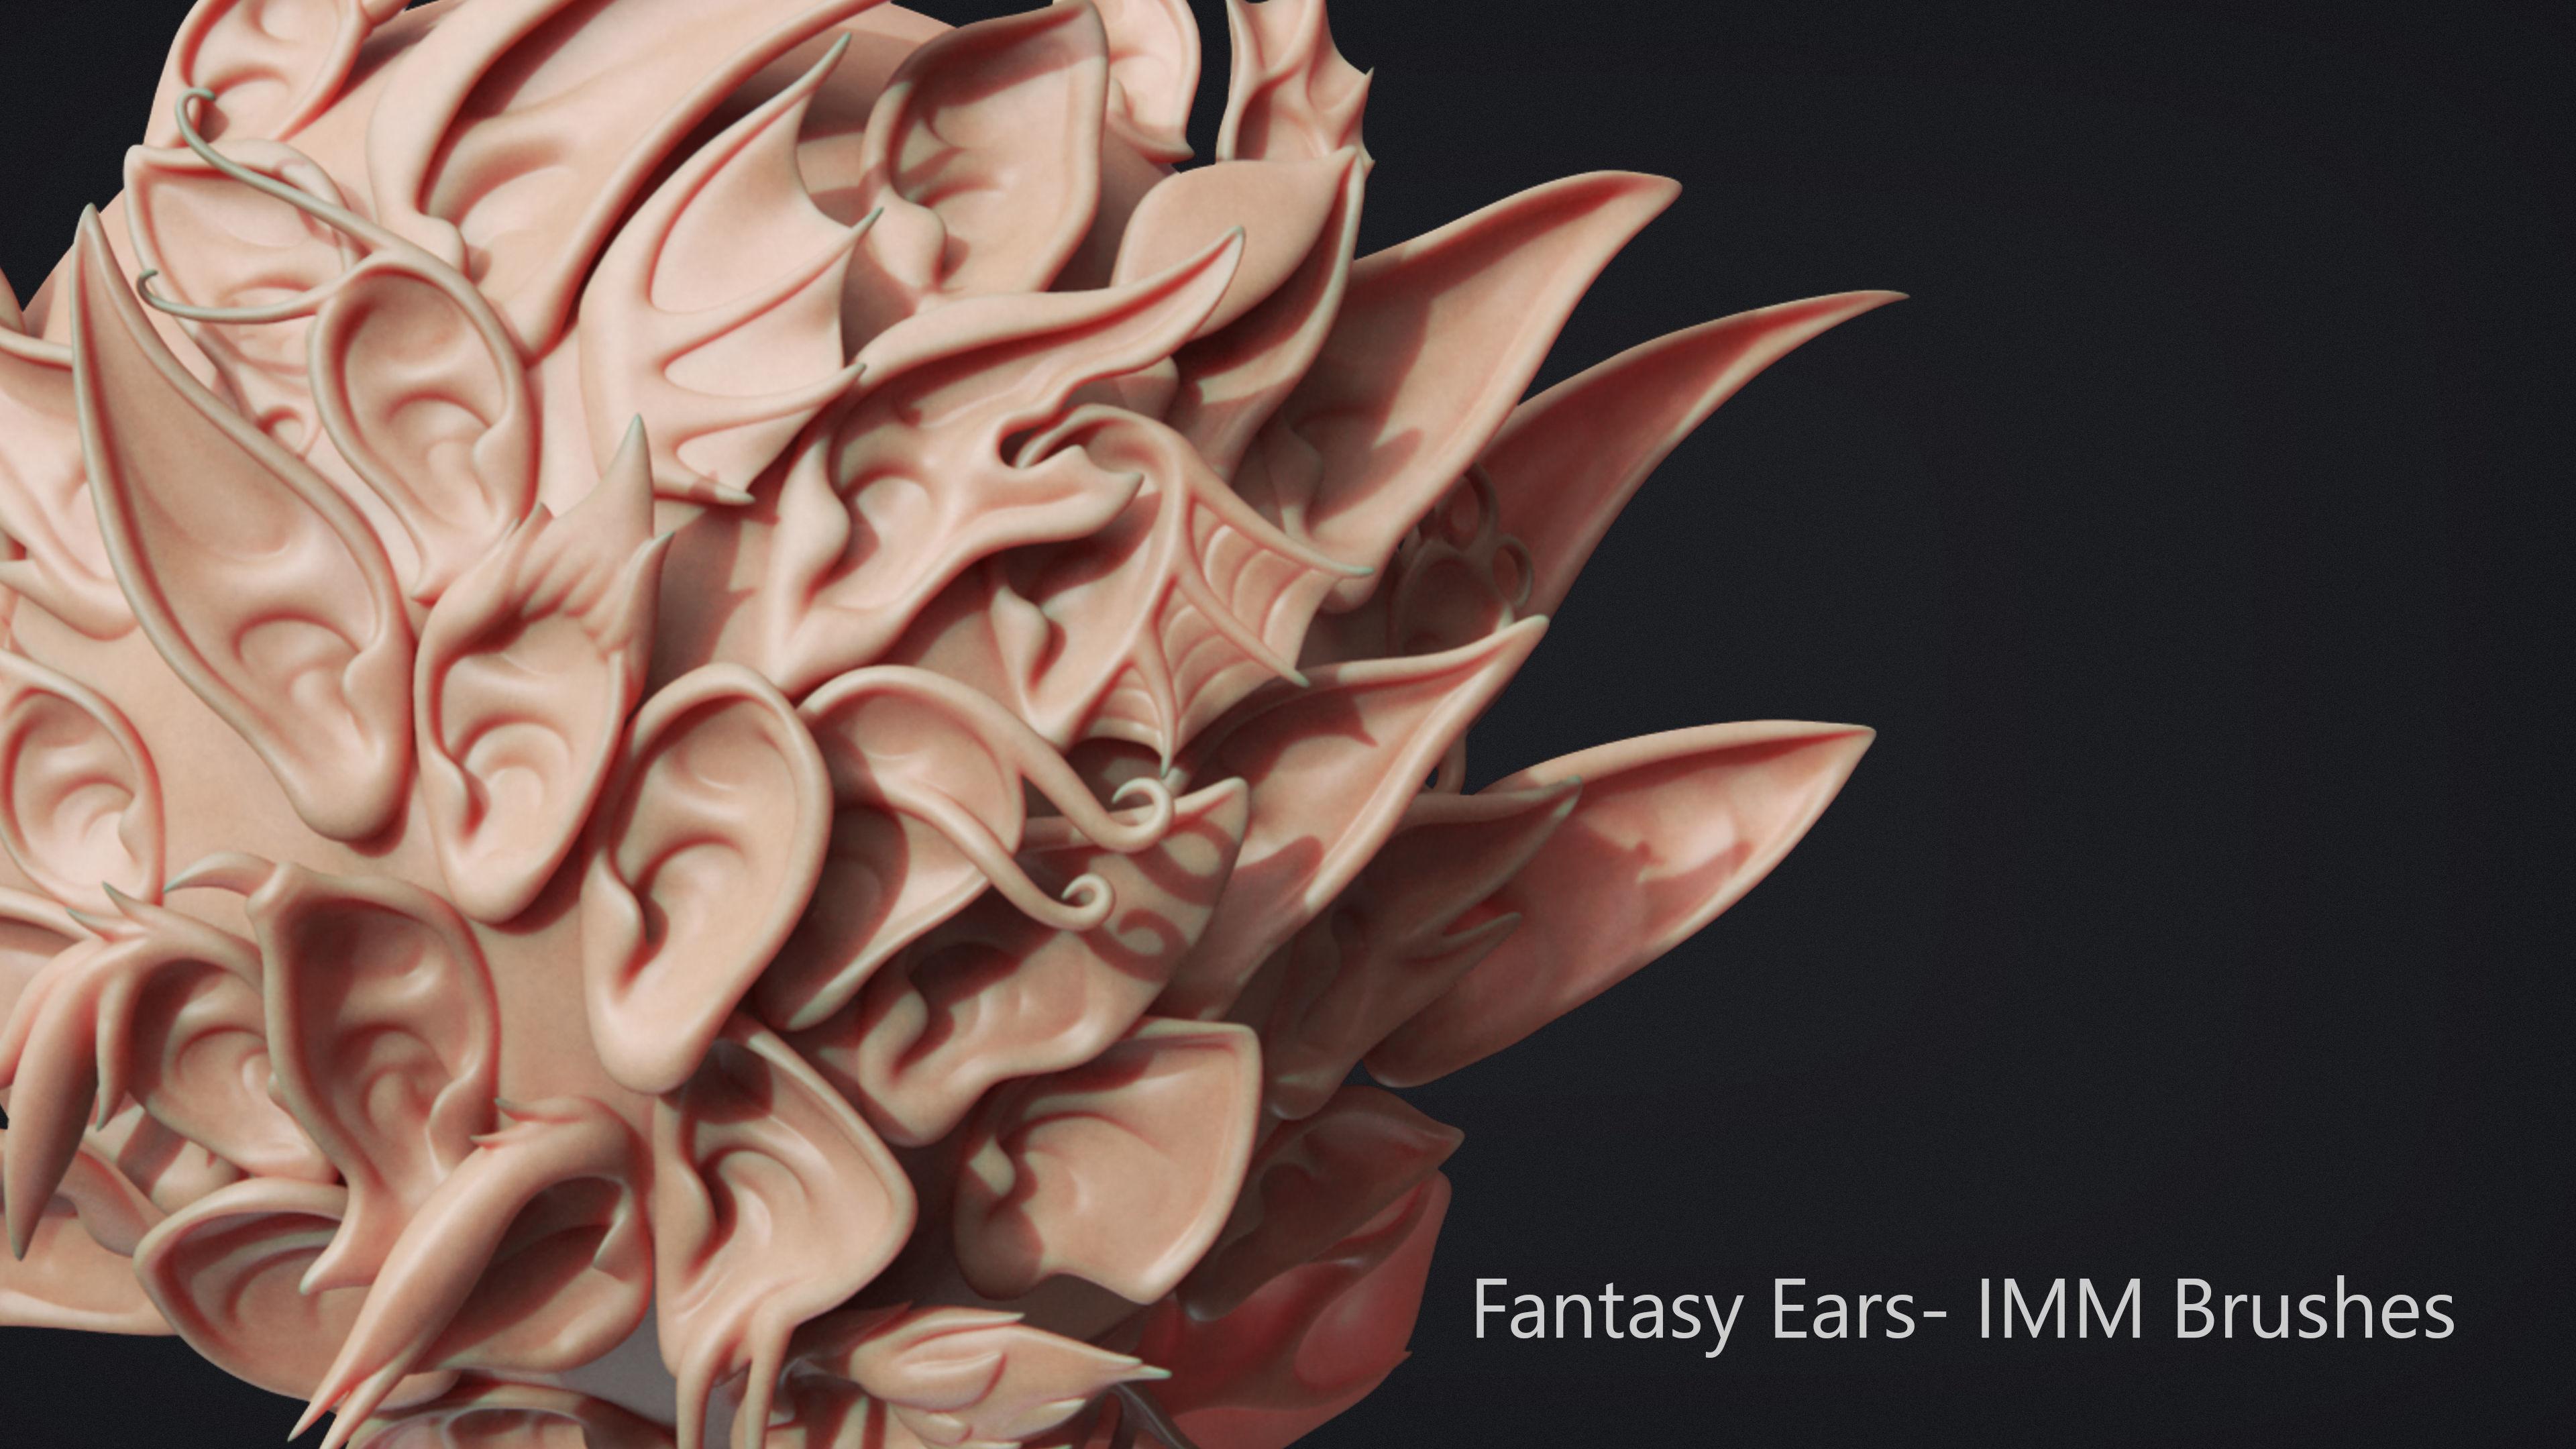 Zbrush - 40 Fantasy Ears - IMM Brush